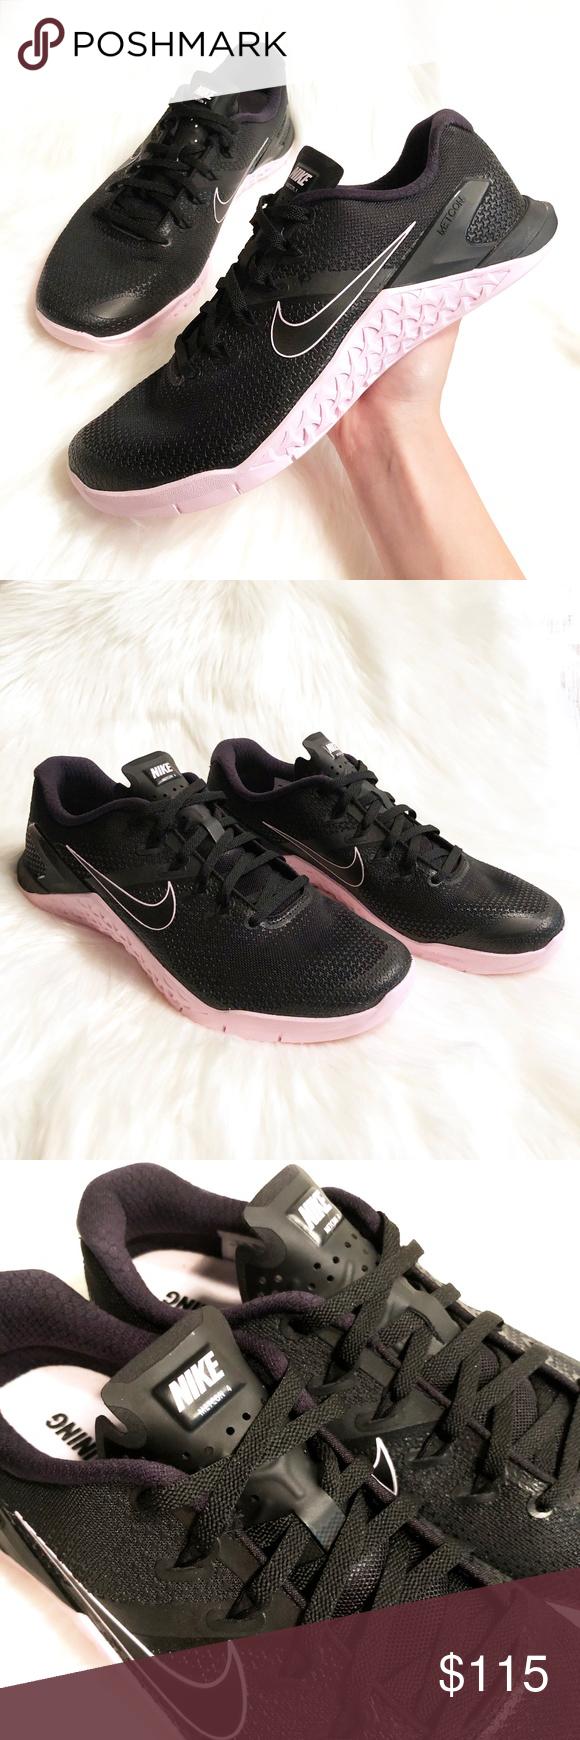 NEW! Nike Metcon 4 Project X Training